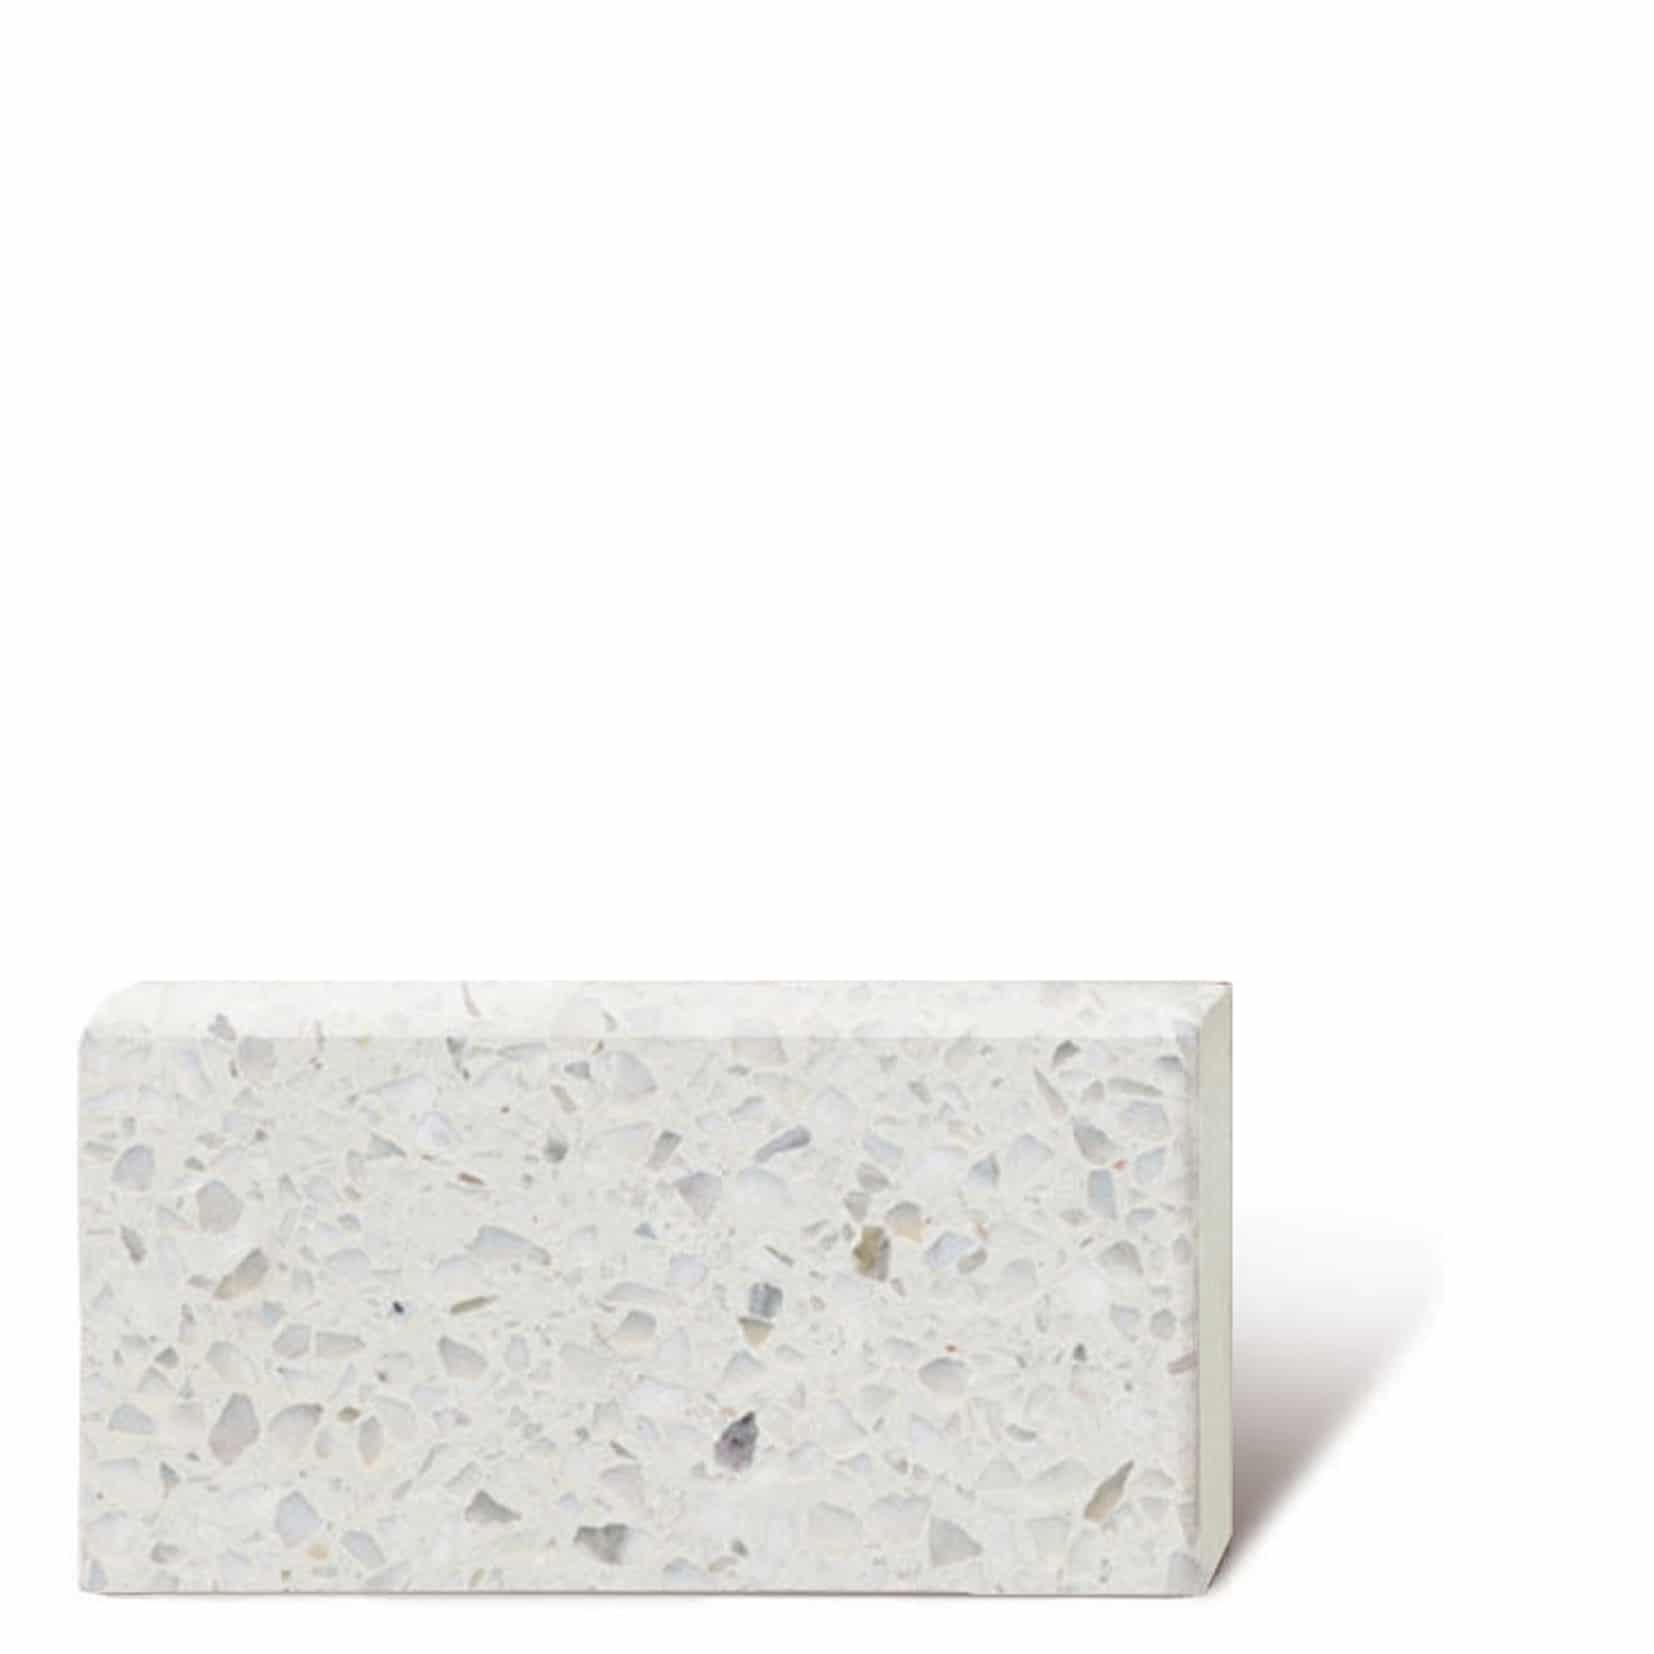 N° 900001w - Sockel Terrazzo GROB